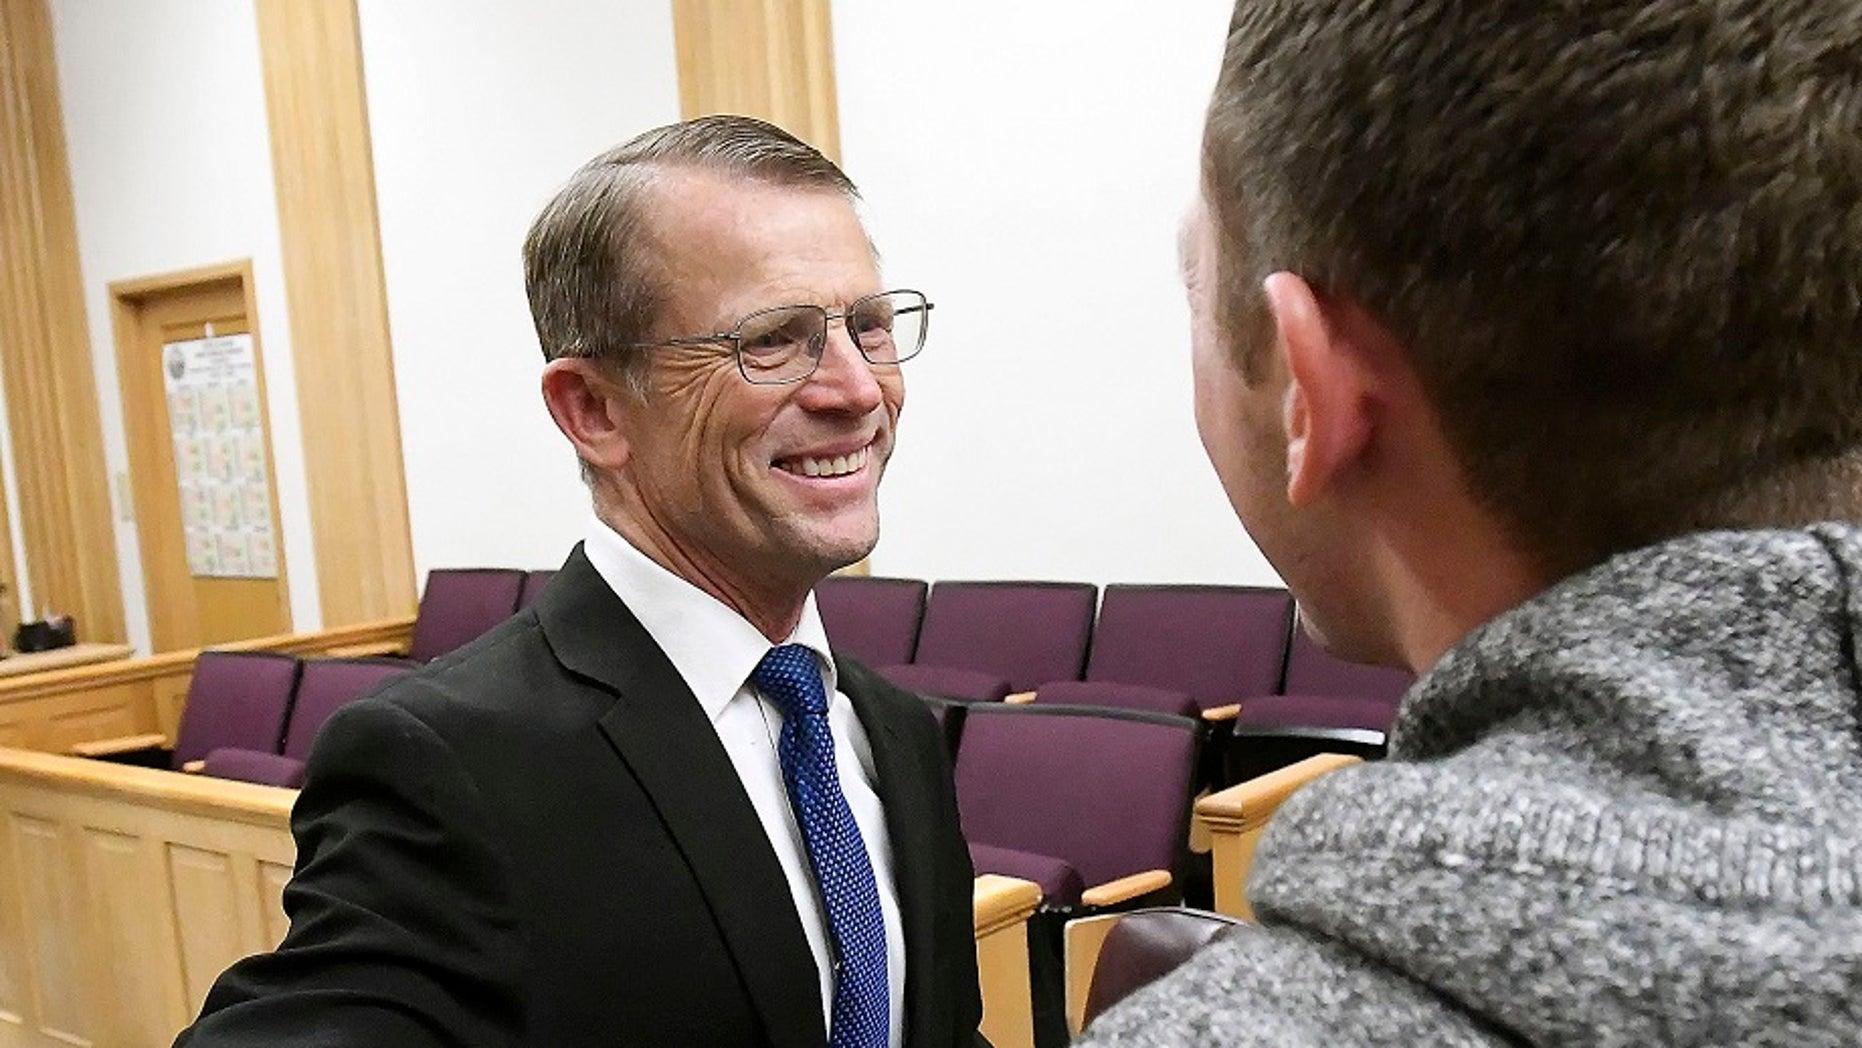 Robert Crosland smiles at son Mario Crosland after Robert was found not guilty of misdemeanor animal cruelty, Friday, Jan. 4, 2019, in Preston, Idaho. (Associated Press)